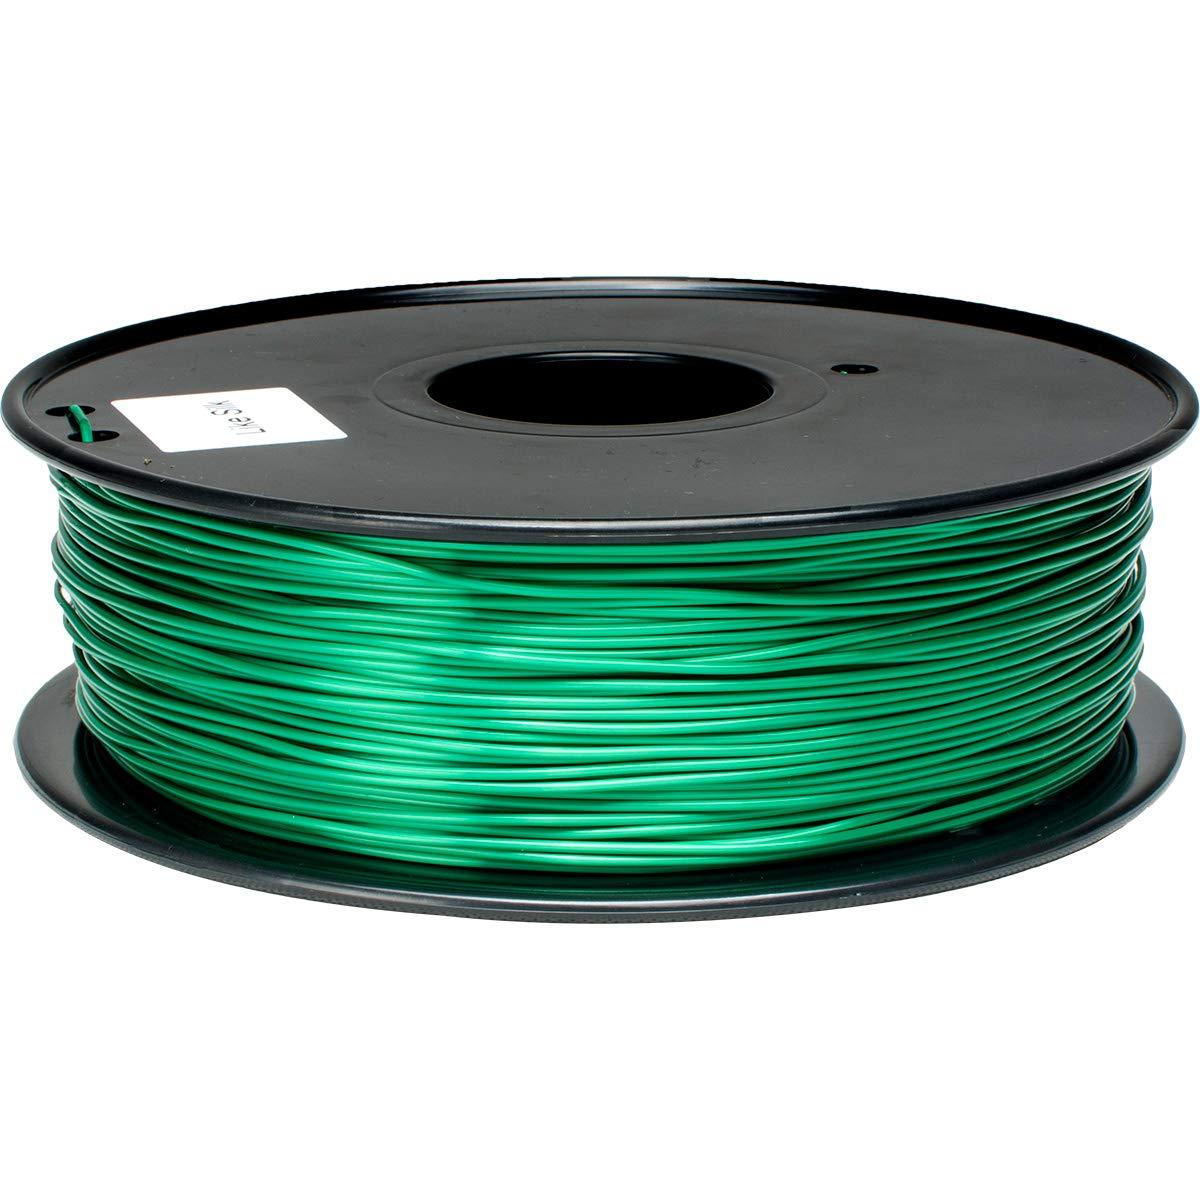 Filamento PLA 1.75mm 1kg COLOR FOTO-1 IMP 3D [7QHWDJR9]